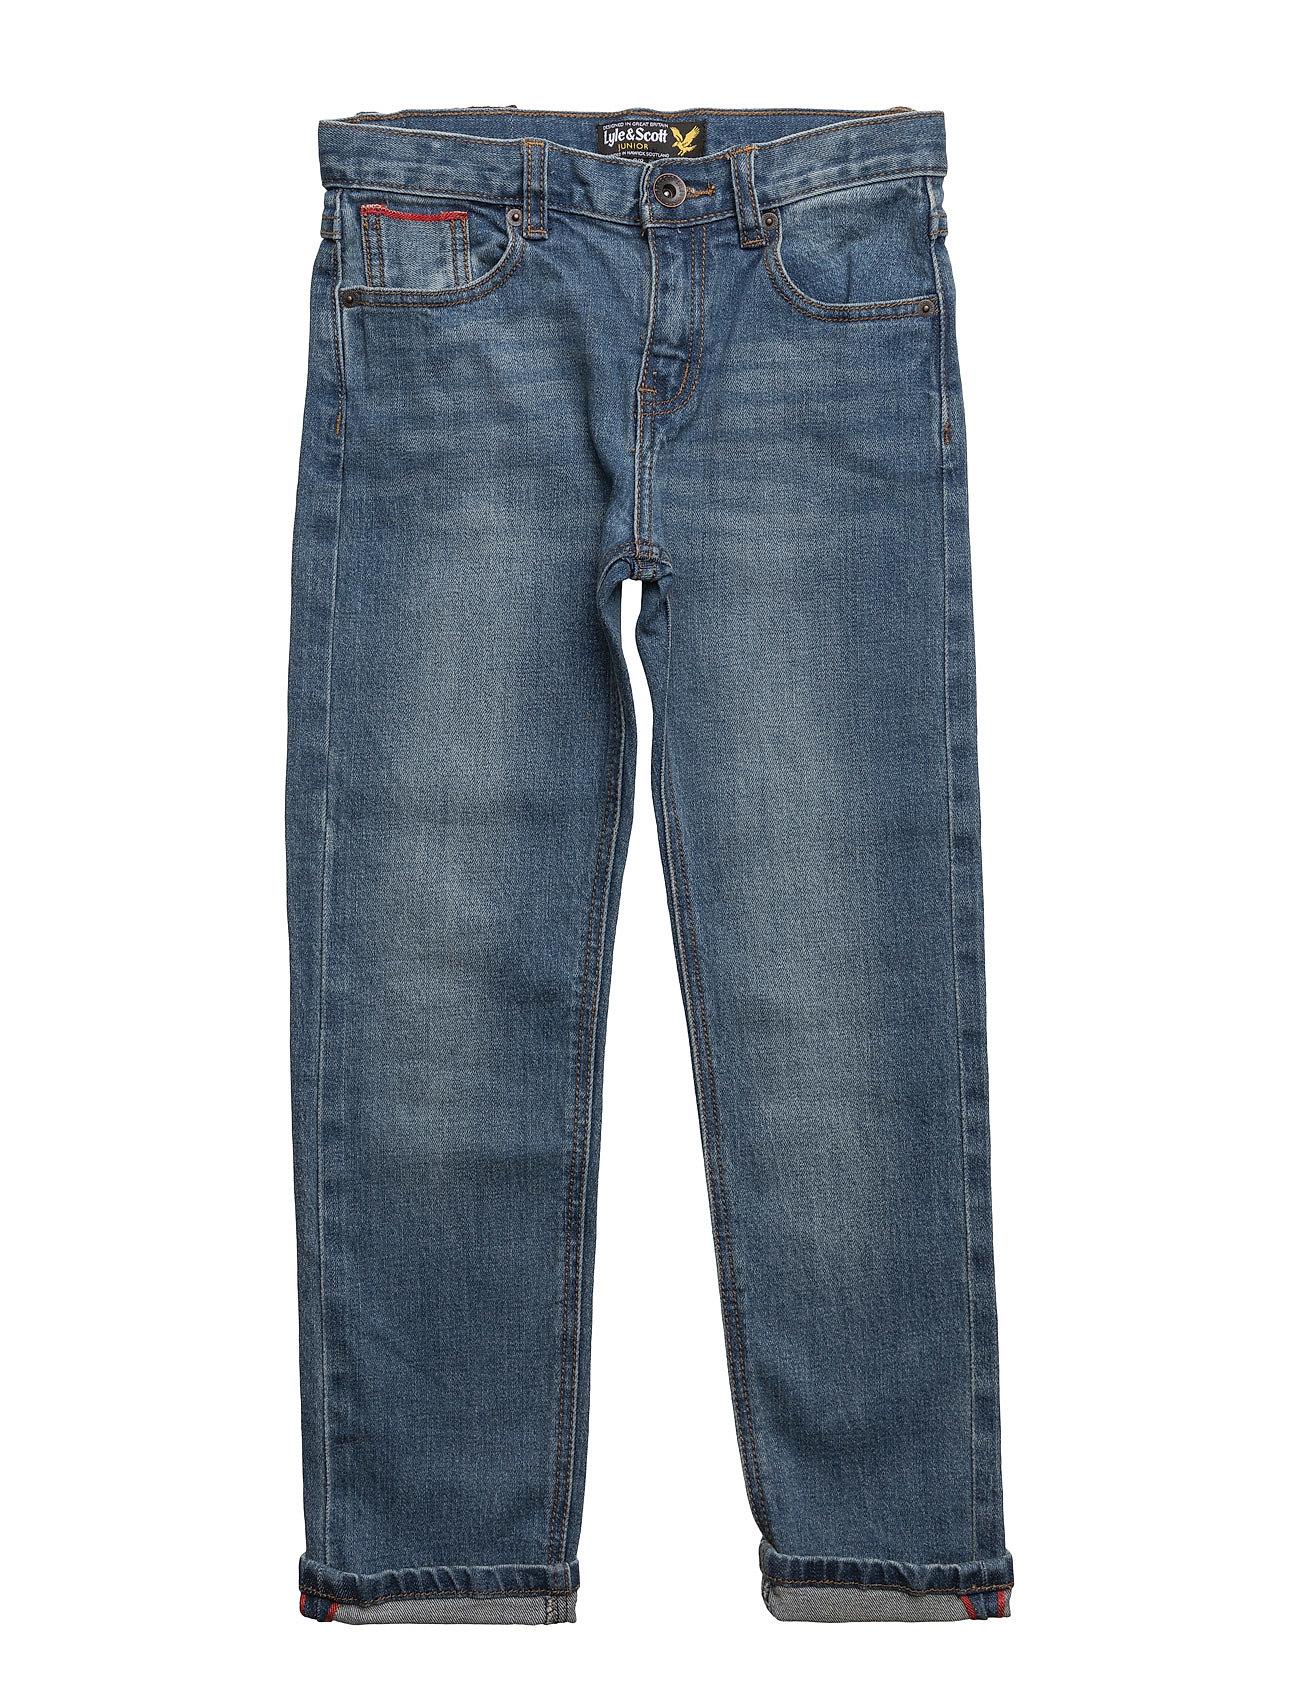 Lyle & Scott Junior Classic Slim Fit Jean - LIGHT WORN